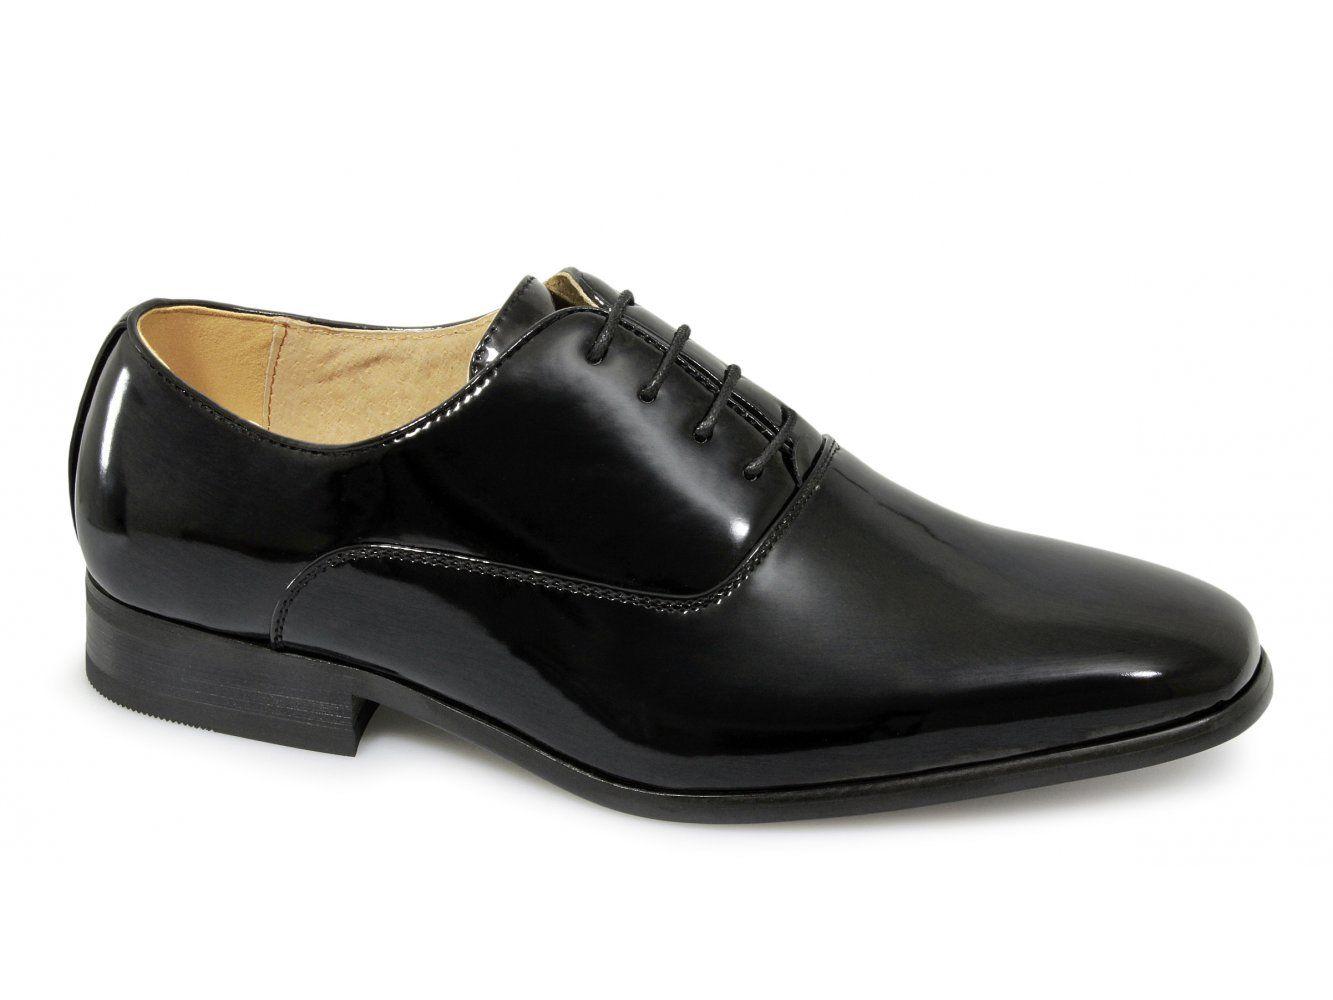 eecb868ec0753 Goor Boys 4 Eyelet Patent Dress Shoes Black | Boy's shoes | Dress ...